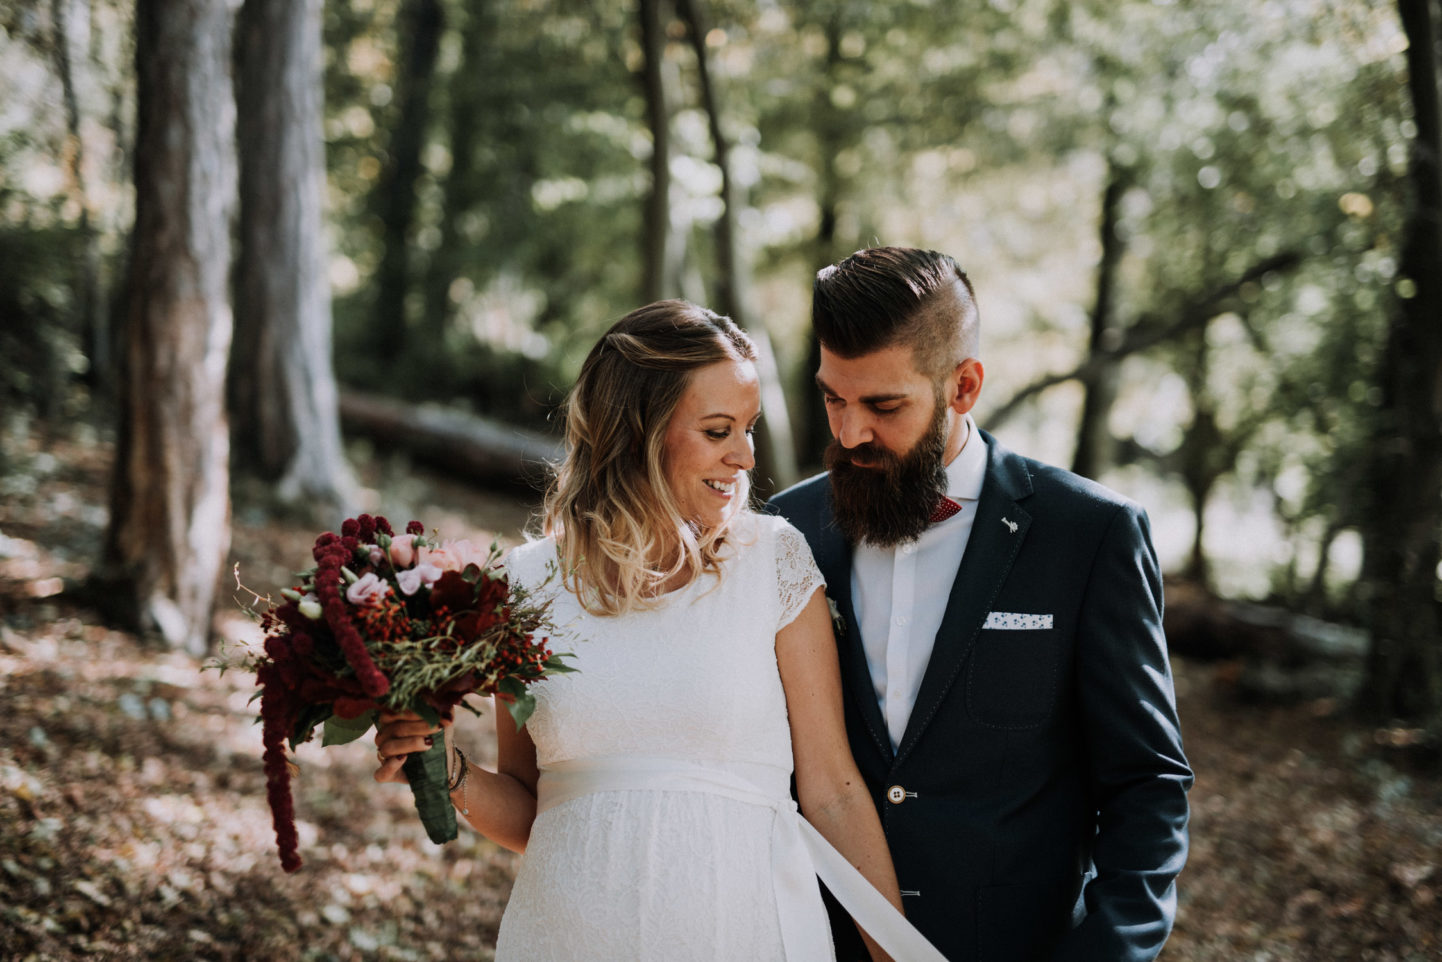 Hipster Photographer wedding